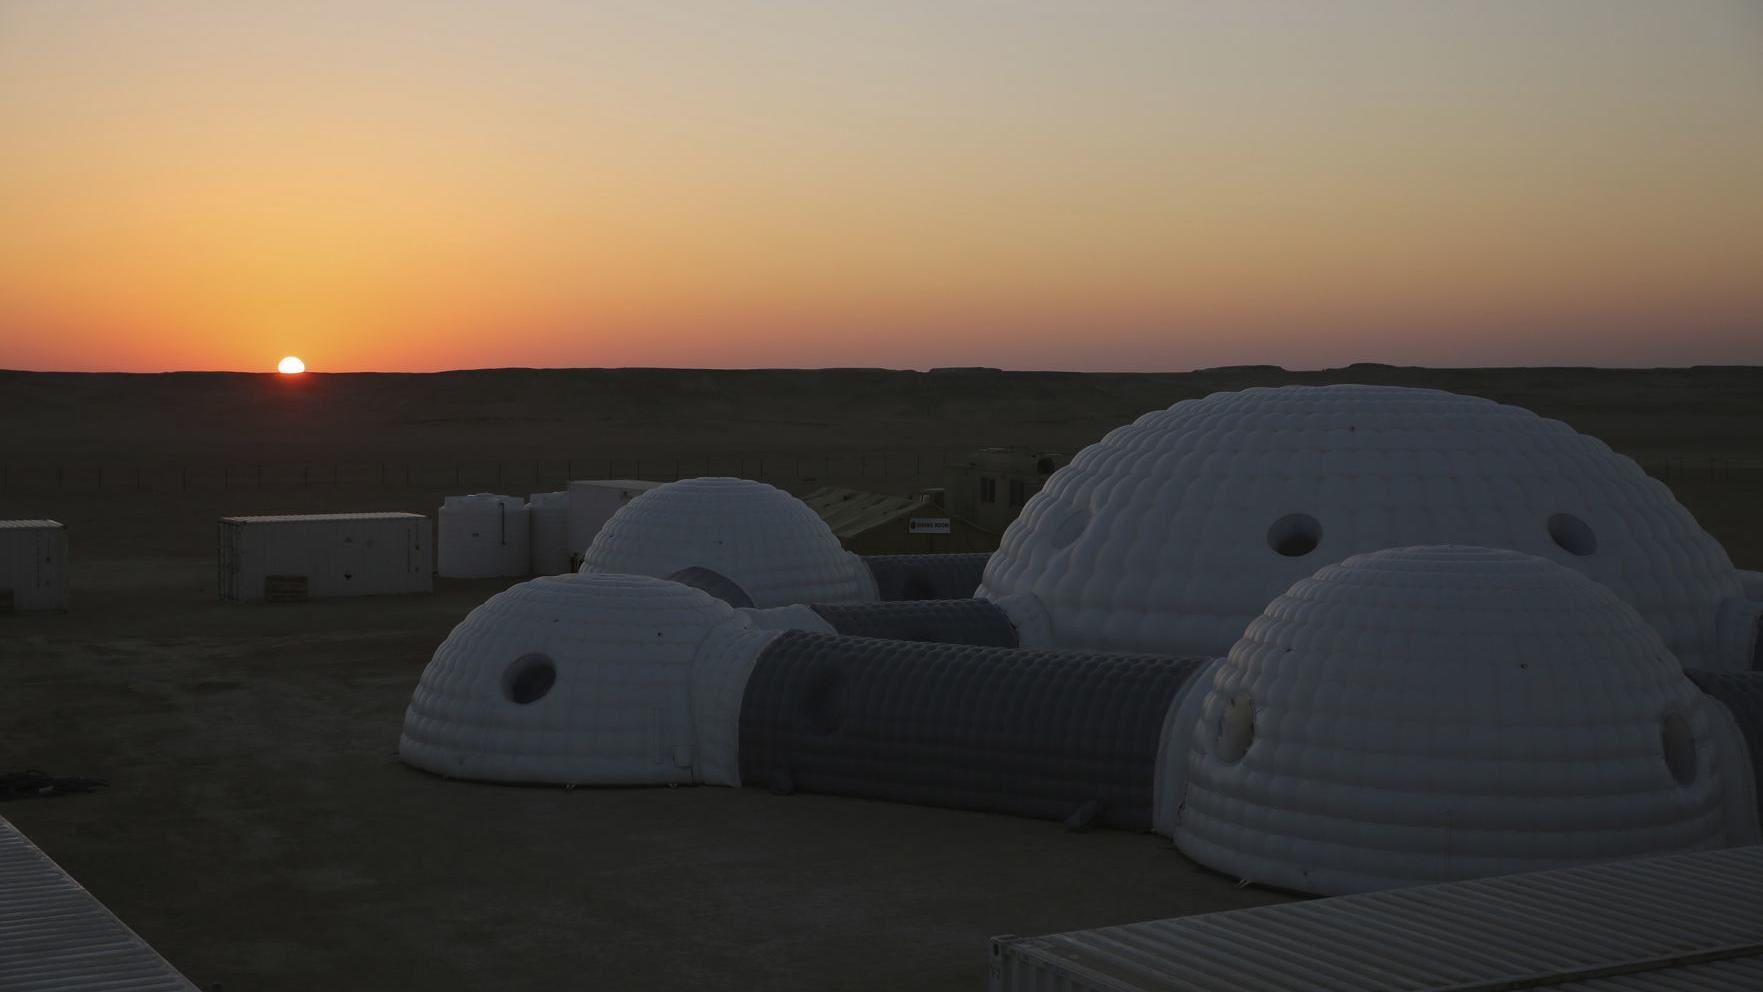 This isn't Mars. It's Oman